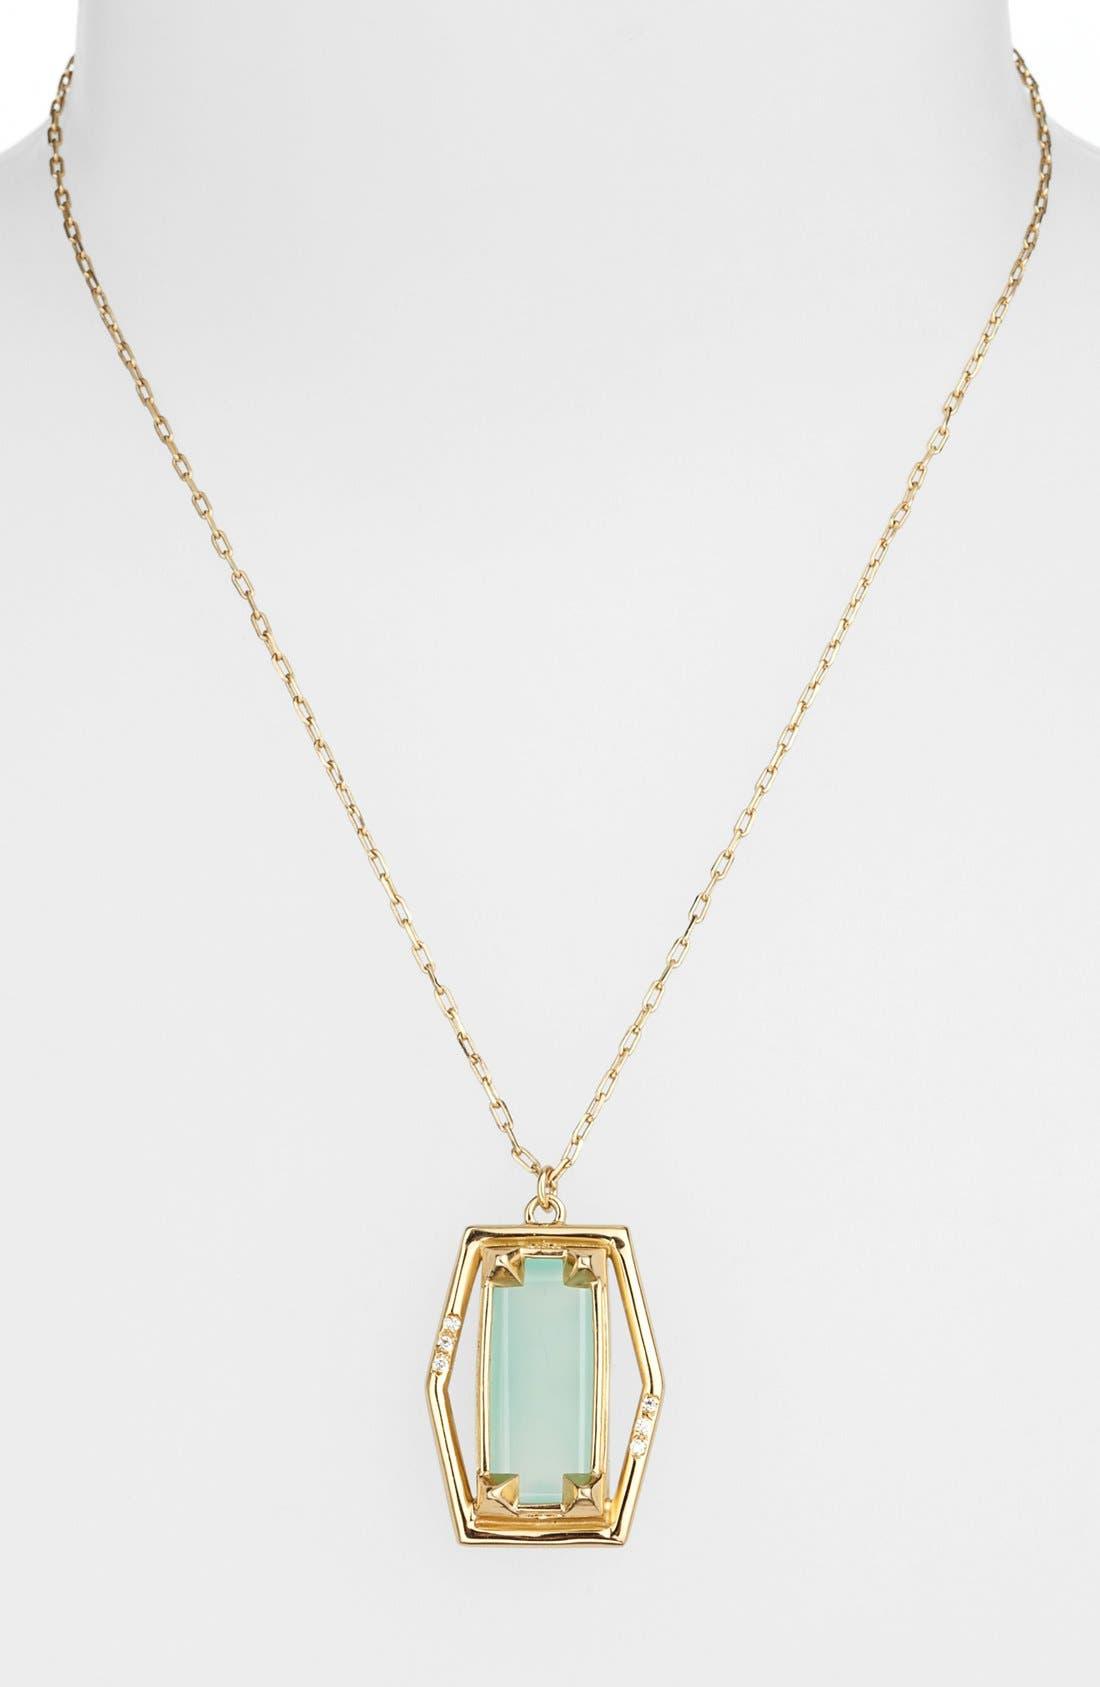 Alternate Image 1 Selected - Melinda Maria 'Thorn - Fenton' Pendant Necklace